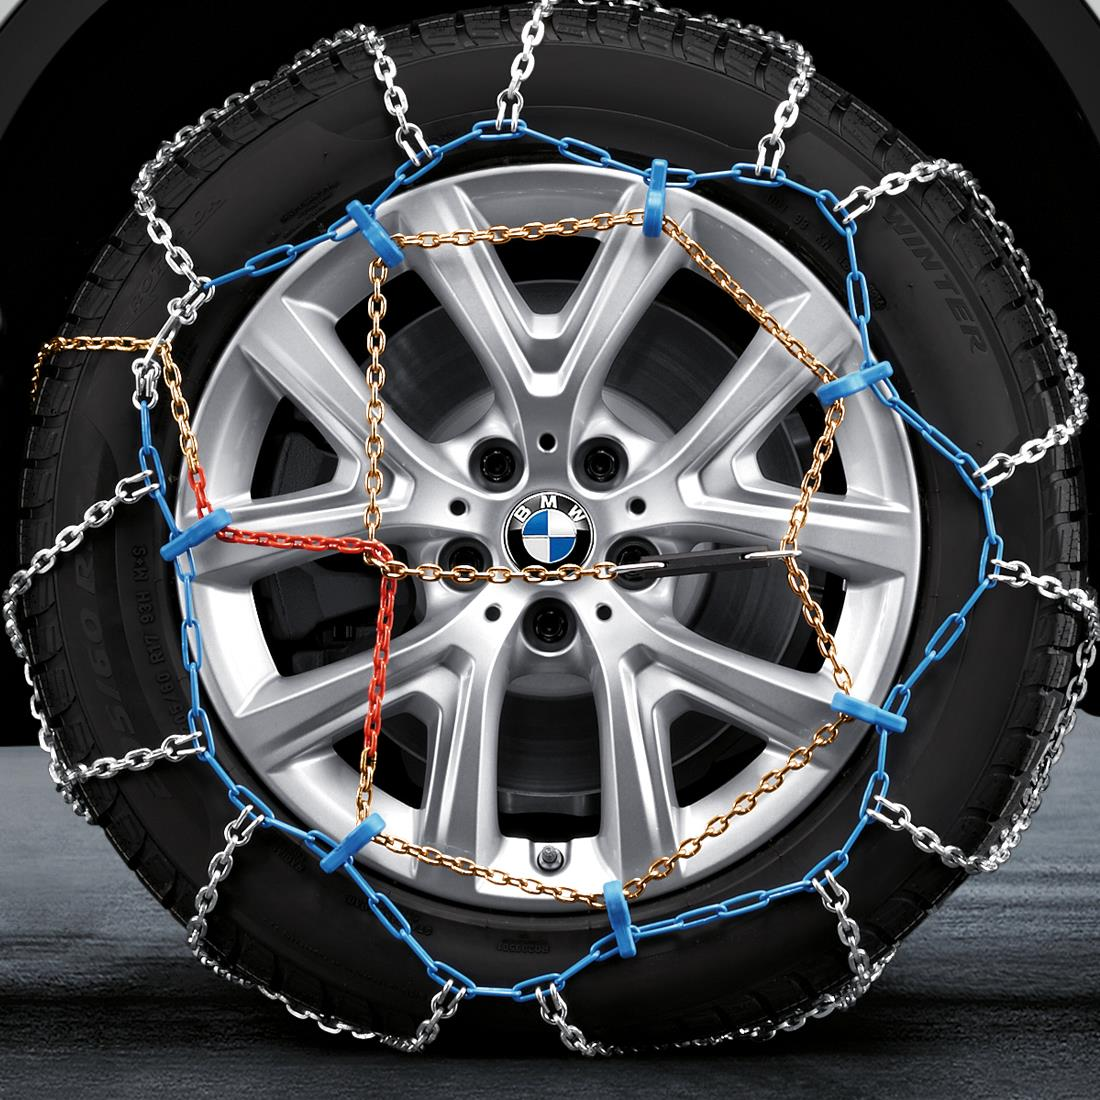 BMW Snow Chain System - 195/55R17